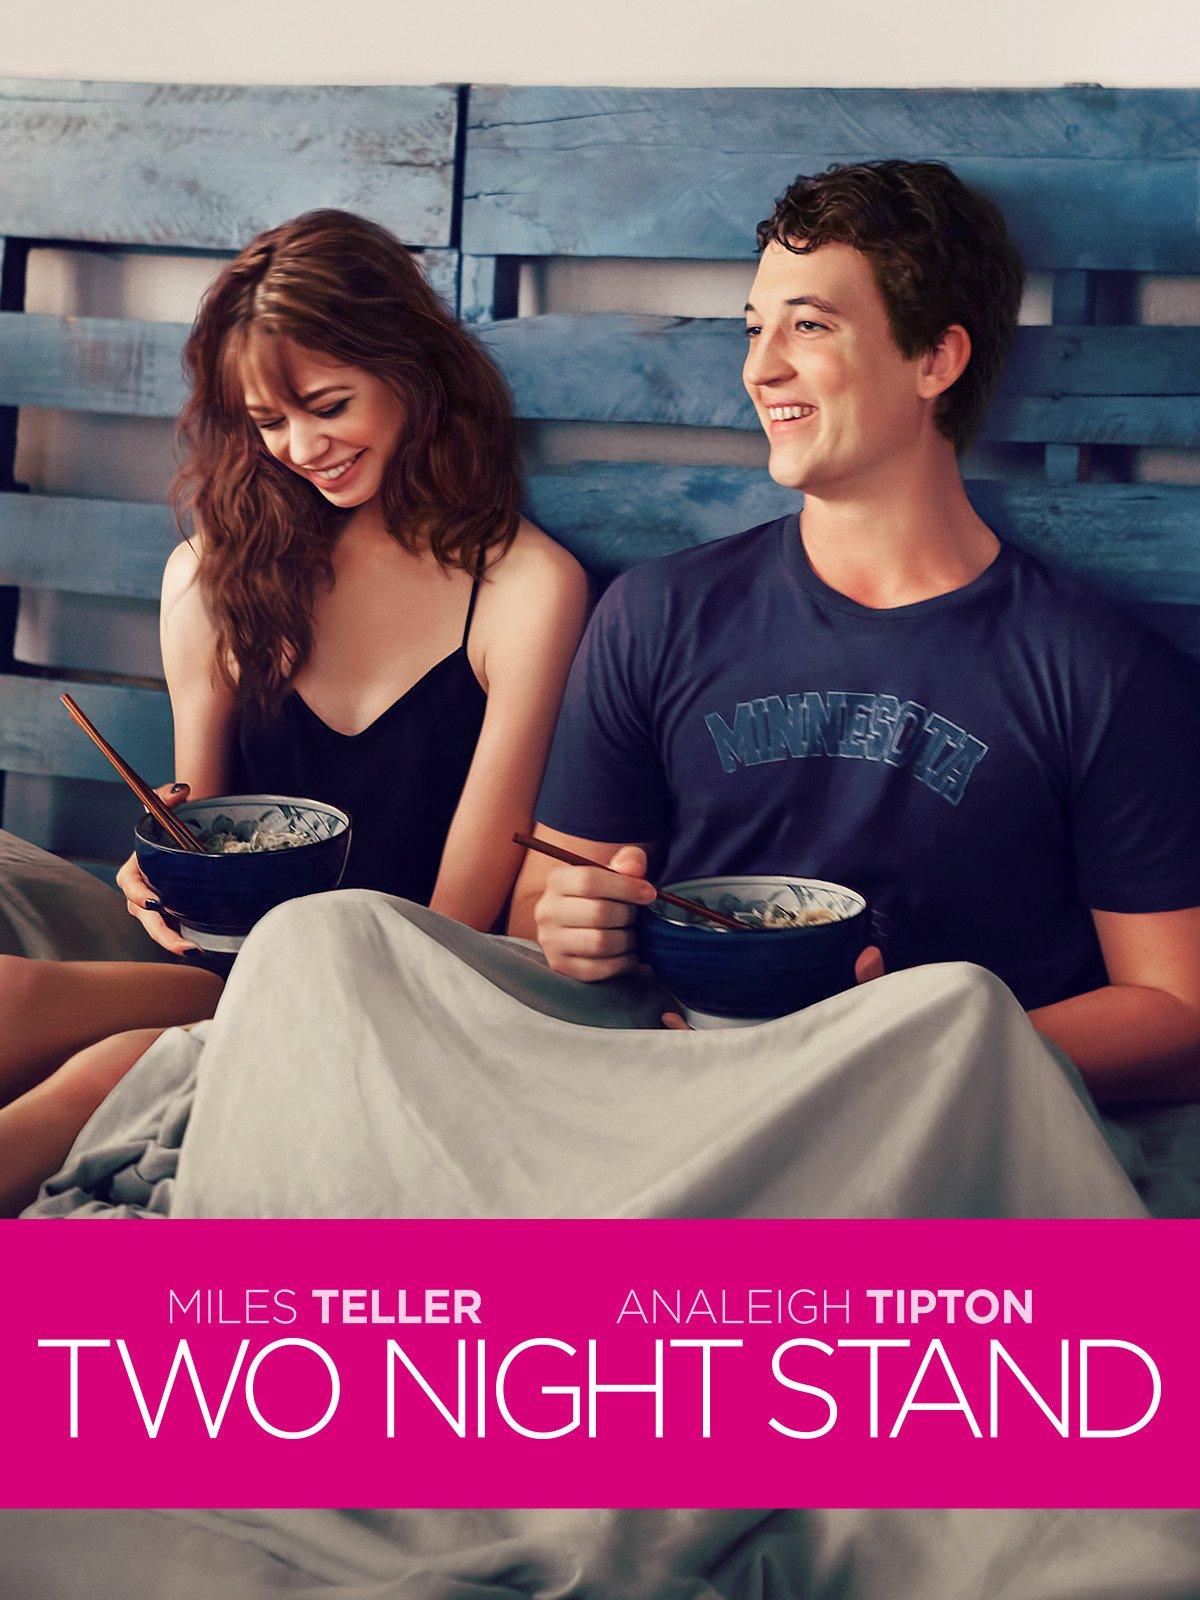 Amazon.com: Two Night Stand: Miles Teller, Analeigh Tipton, Kid Cudi ...